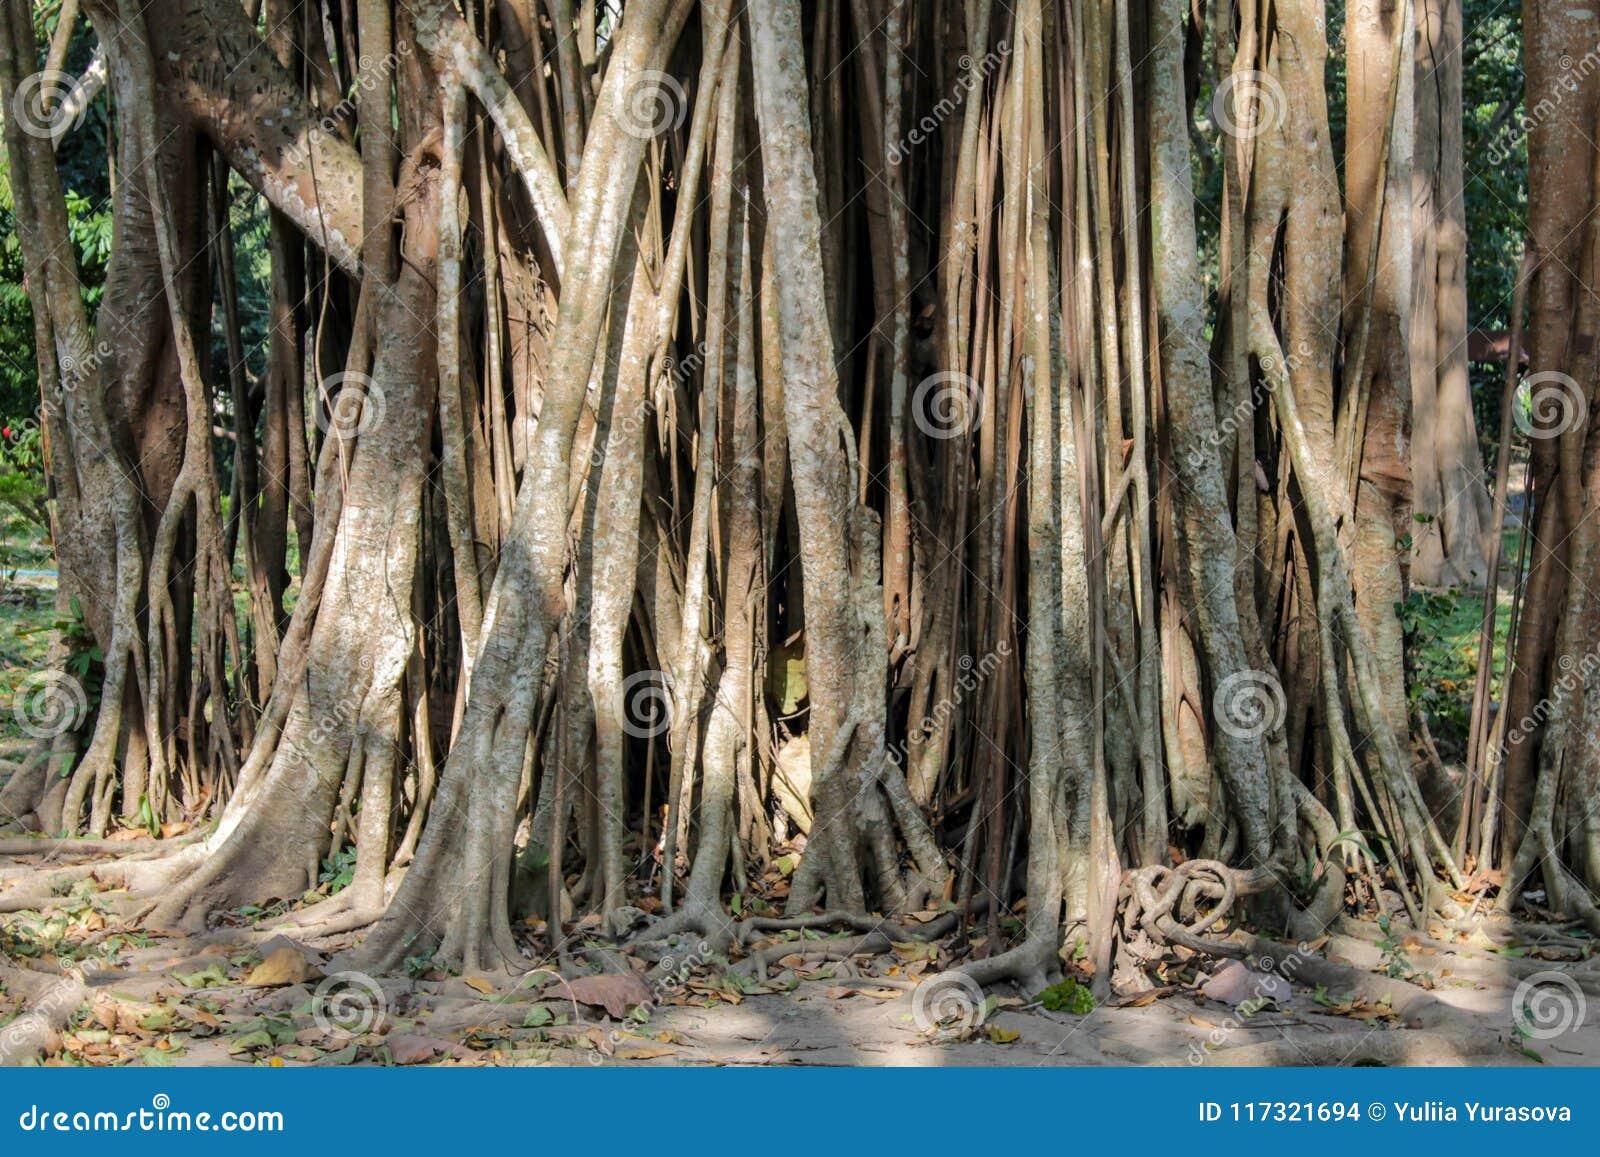 Корни баньяна лесного дерева джунглей в тропическом тропическом лесе